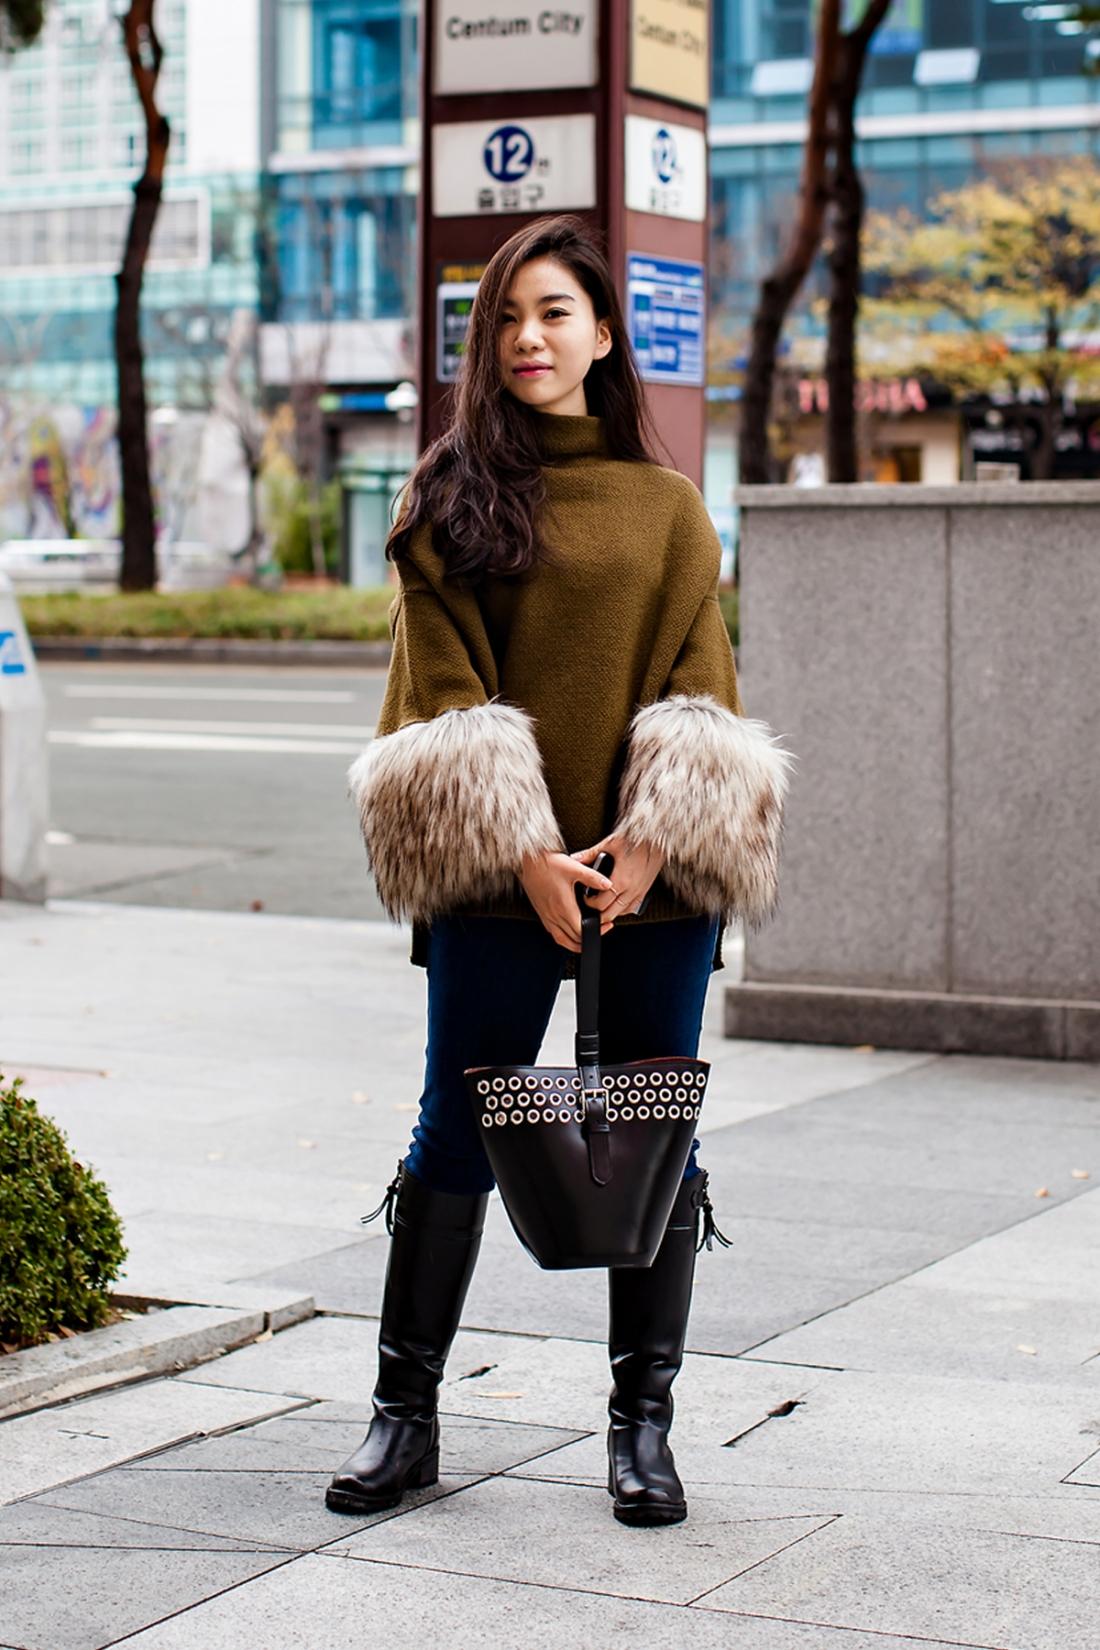 On the street… Lee Danbi